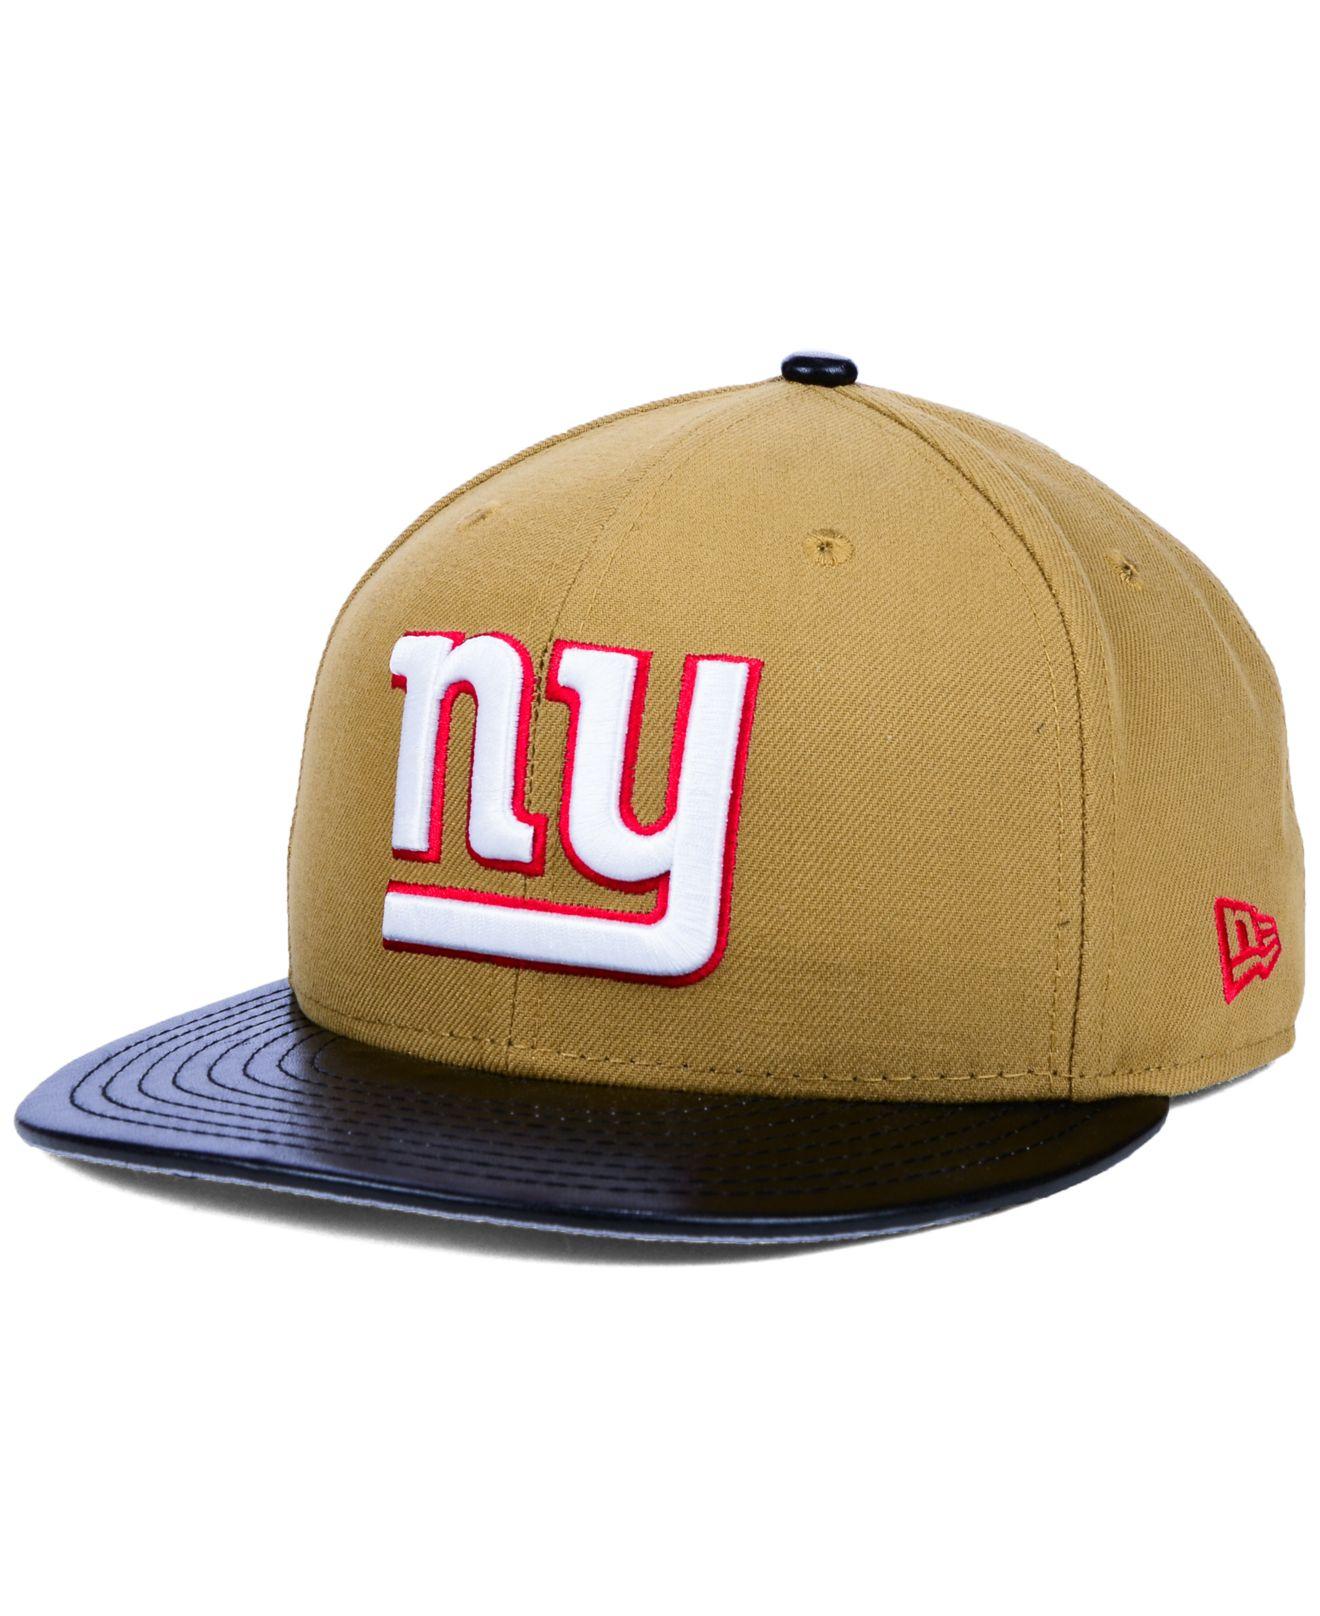 Lyst - KTZ New York Giants Faux-leather Wheat 9fifty Snapback Cap in ... 2960c7b8439